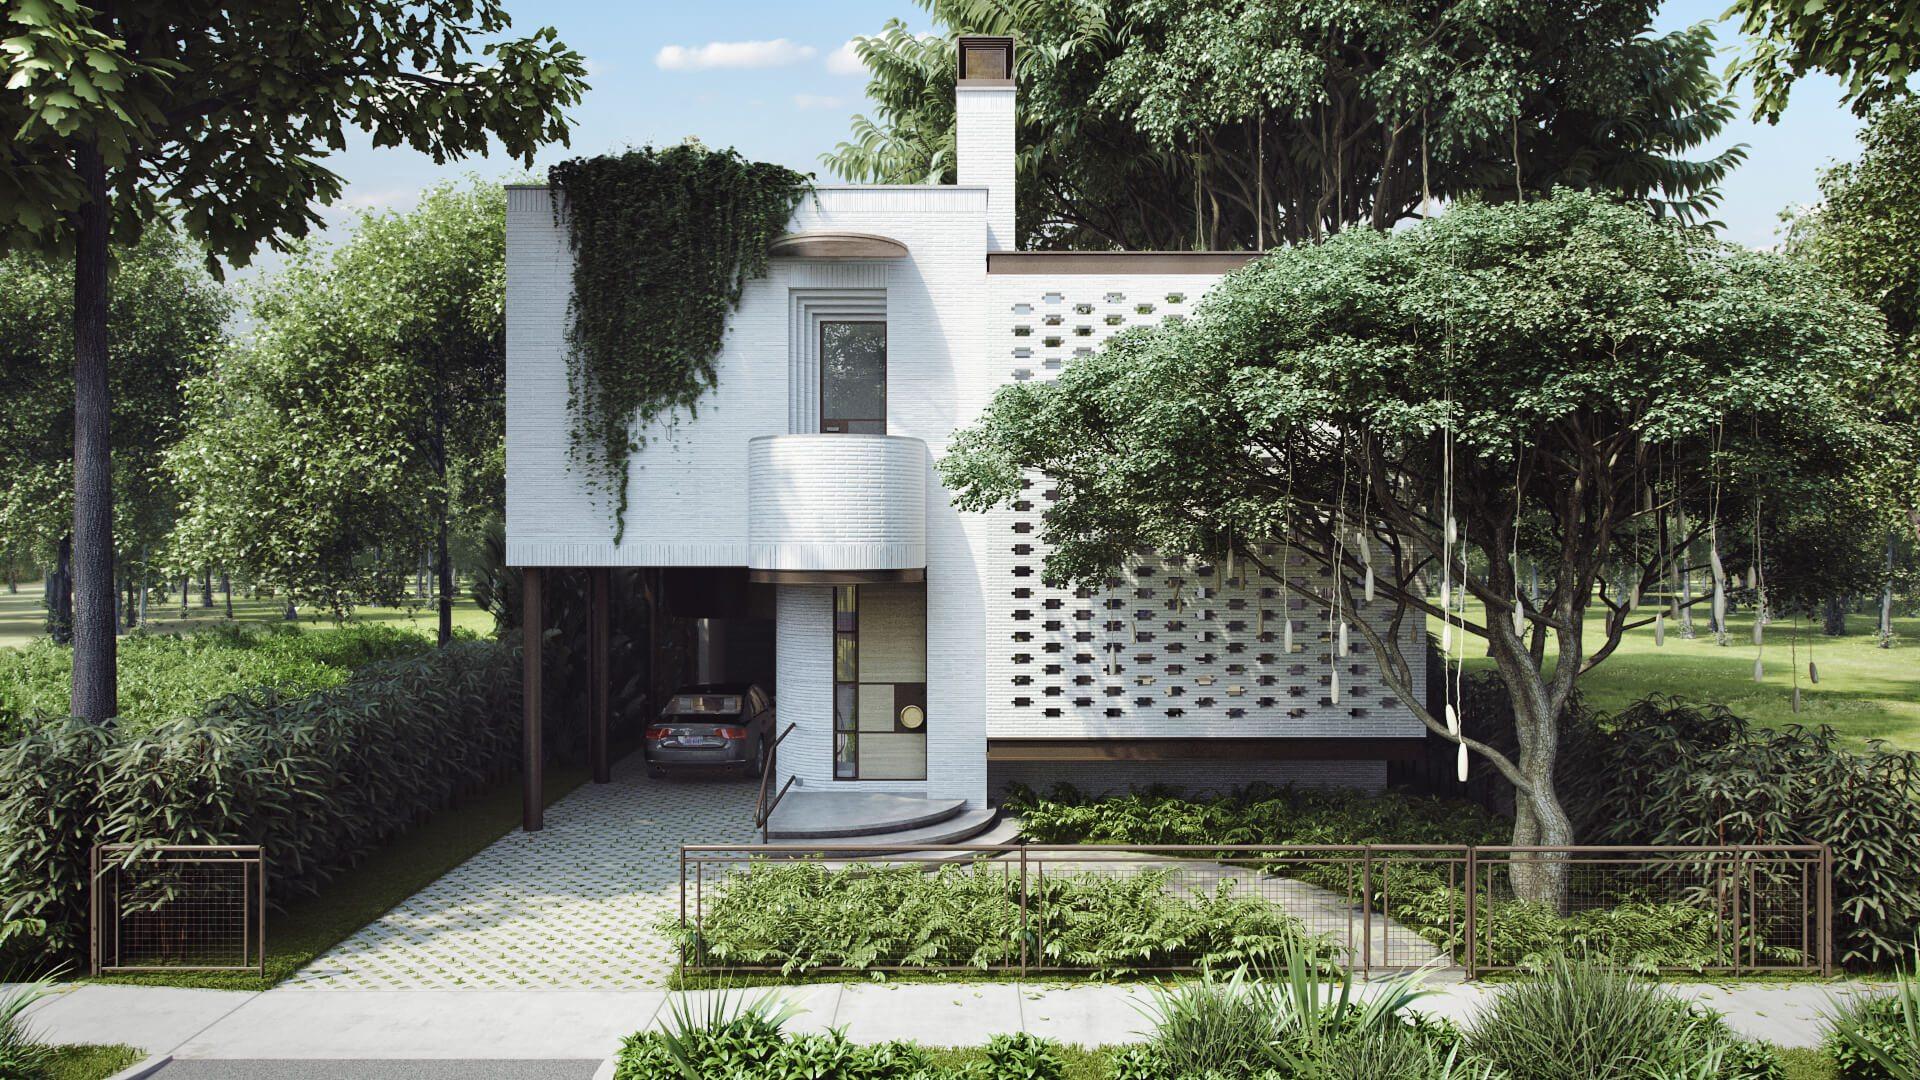 Photorealistic CGI for a House Exterior Concept